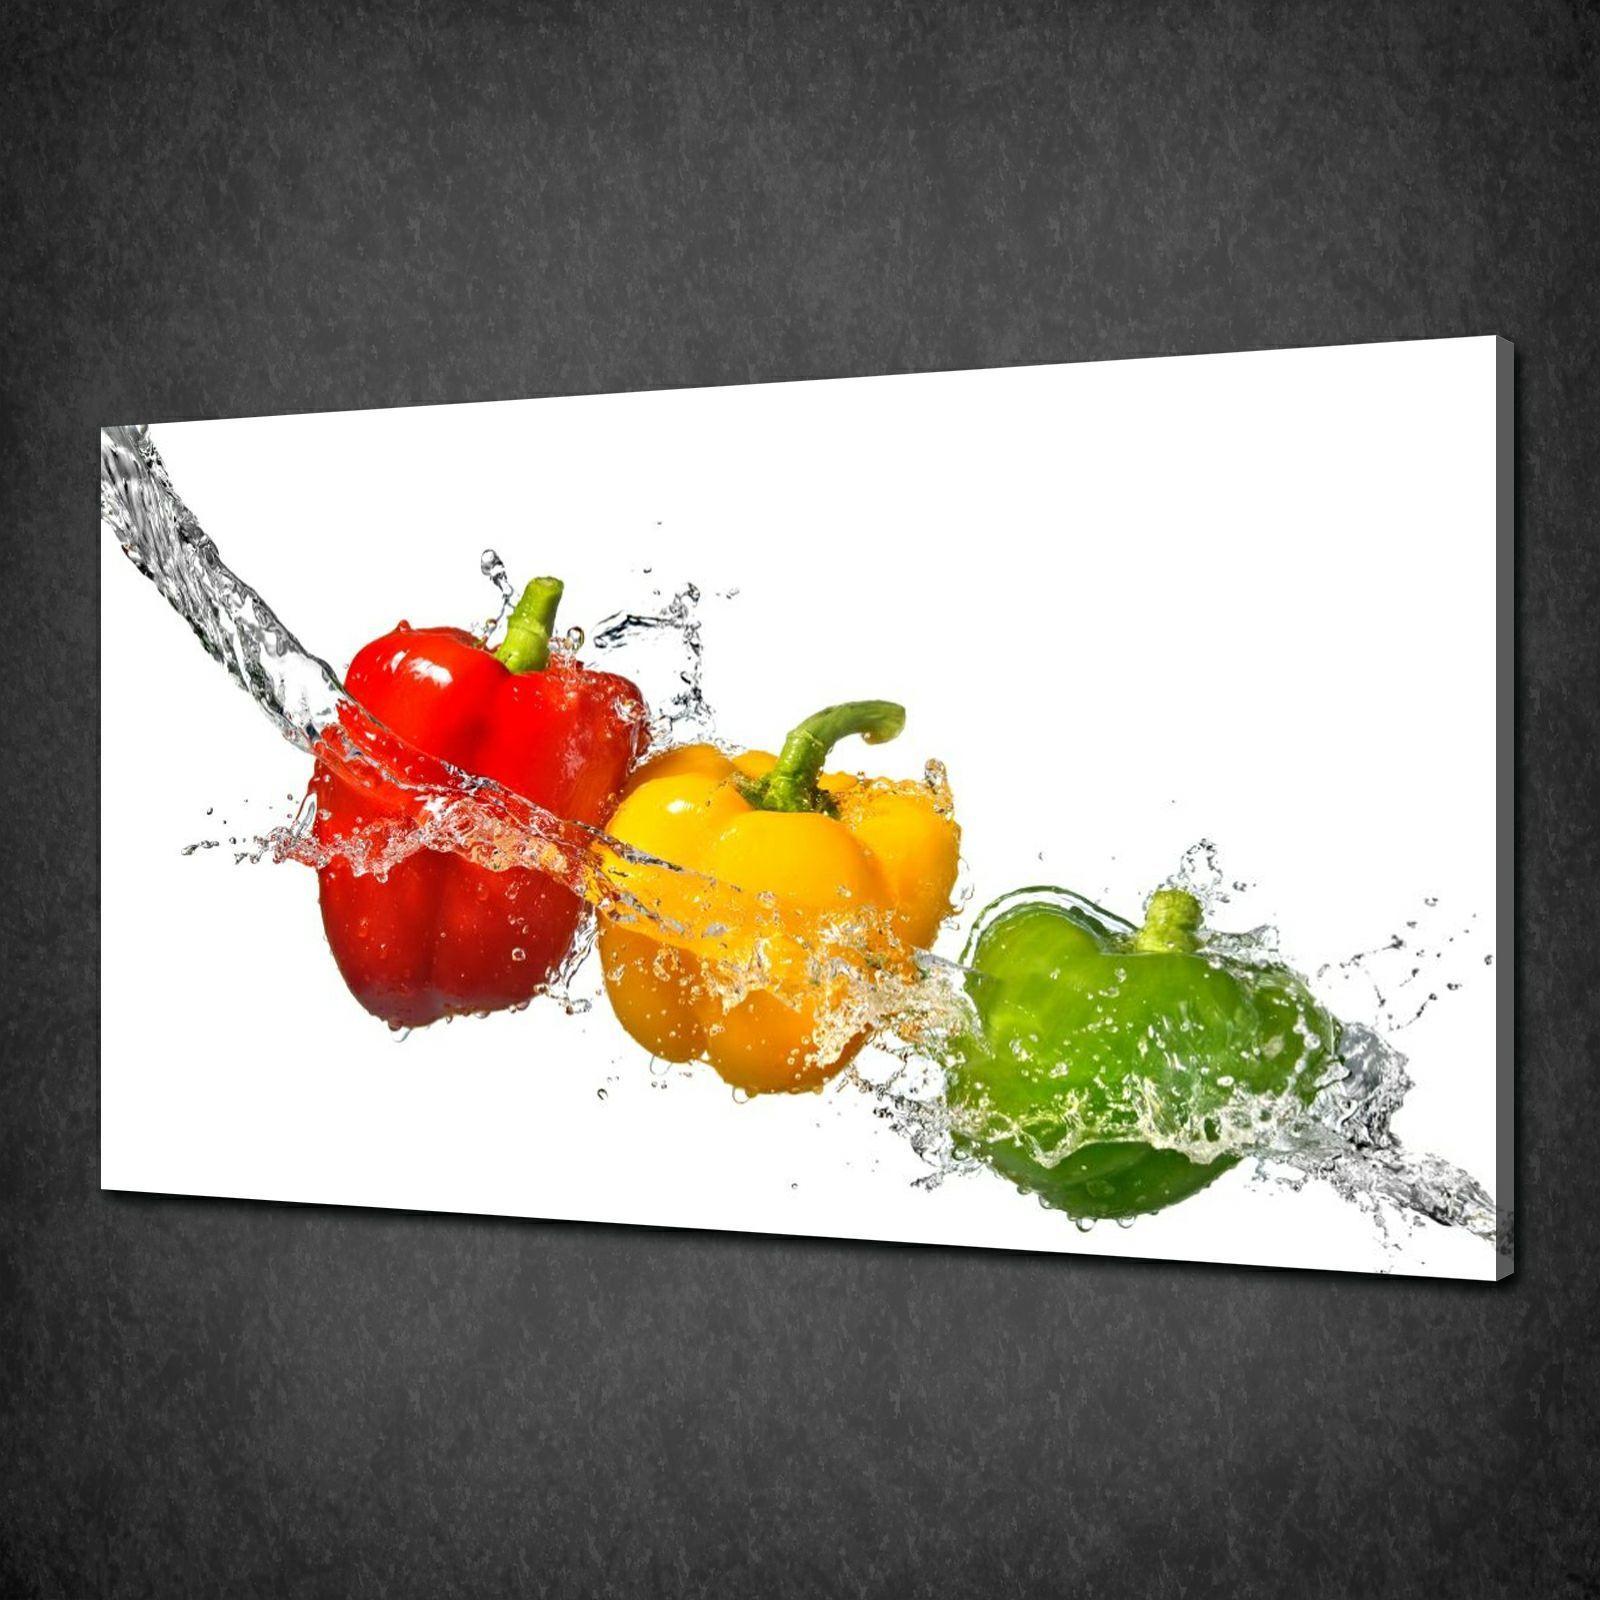 Kitchen Art Colourful Peppers Splash Kitchen Art Canvas Print Picture Poster